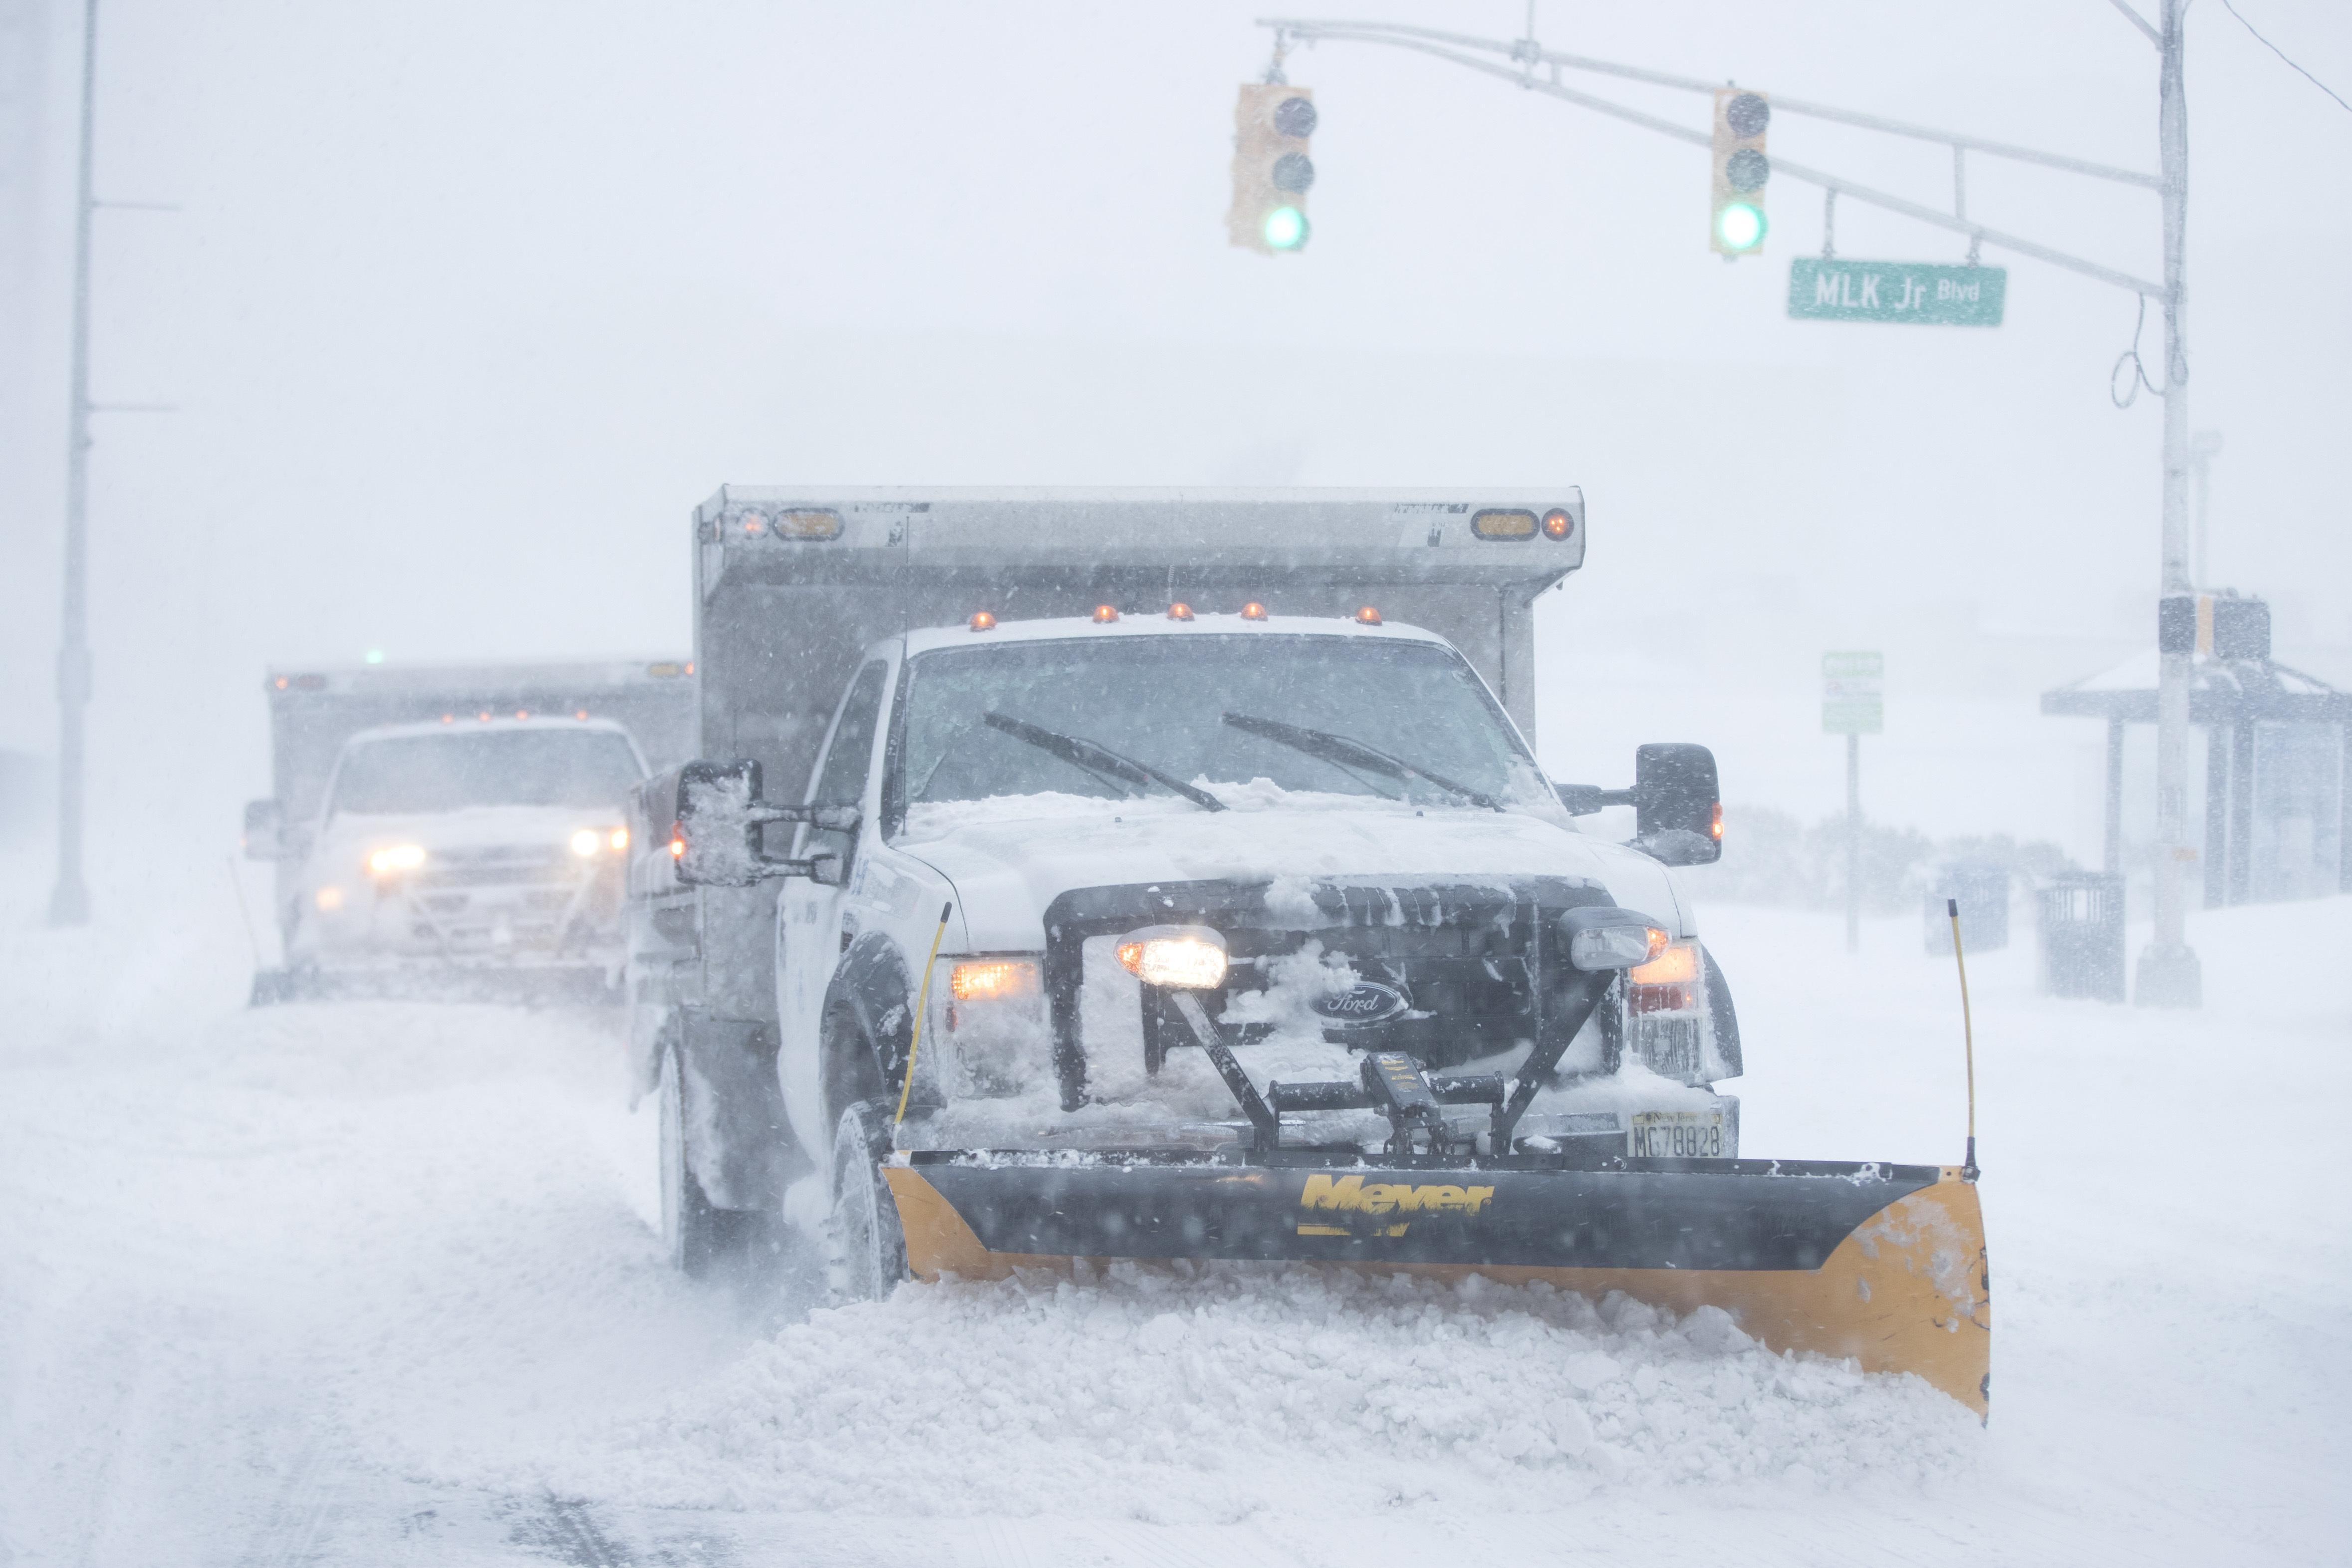 "<div class=""meta image-caption""><div class=""origin-logo origin-image none""><span>none</span></div><span class=""caption-text"">Plows clear streets during a winter snowstorm in Atlantic City, N.J., Thursday, Jan. 4, 2018. (AP Photo/Matt Rourke) (AP)</span></div>"